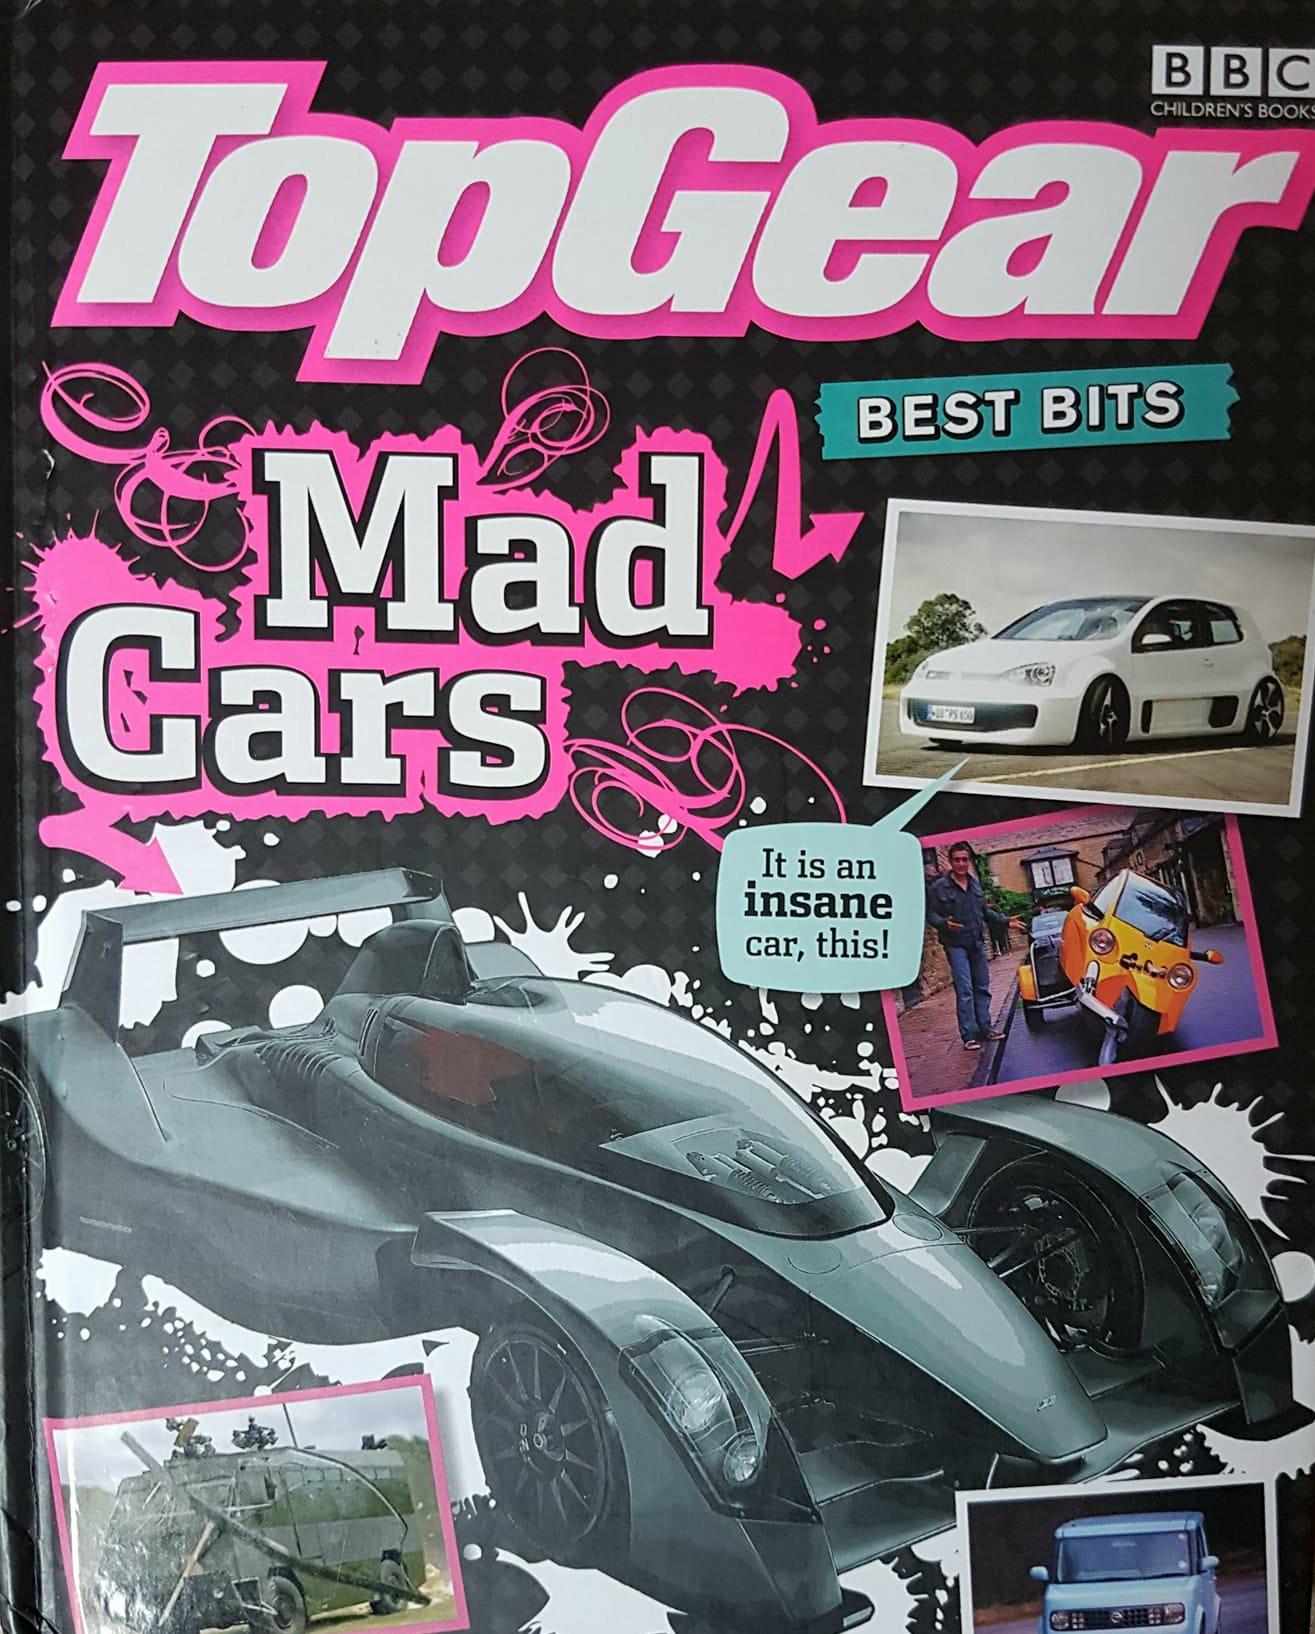 Top Gear: Best Bits Mad Cars: Amazon.es: BBC Books: Libros en idiomas extranjeros